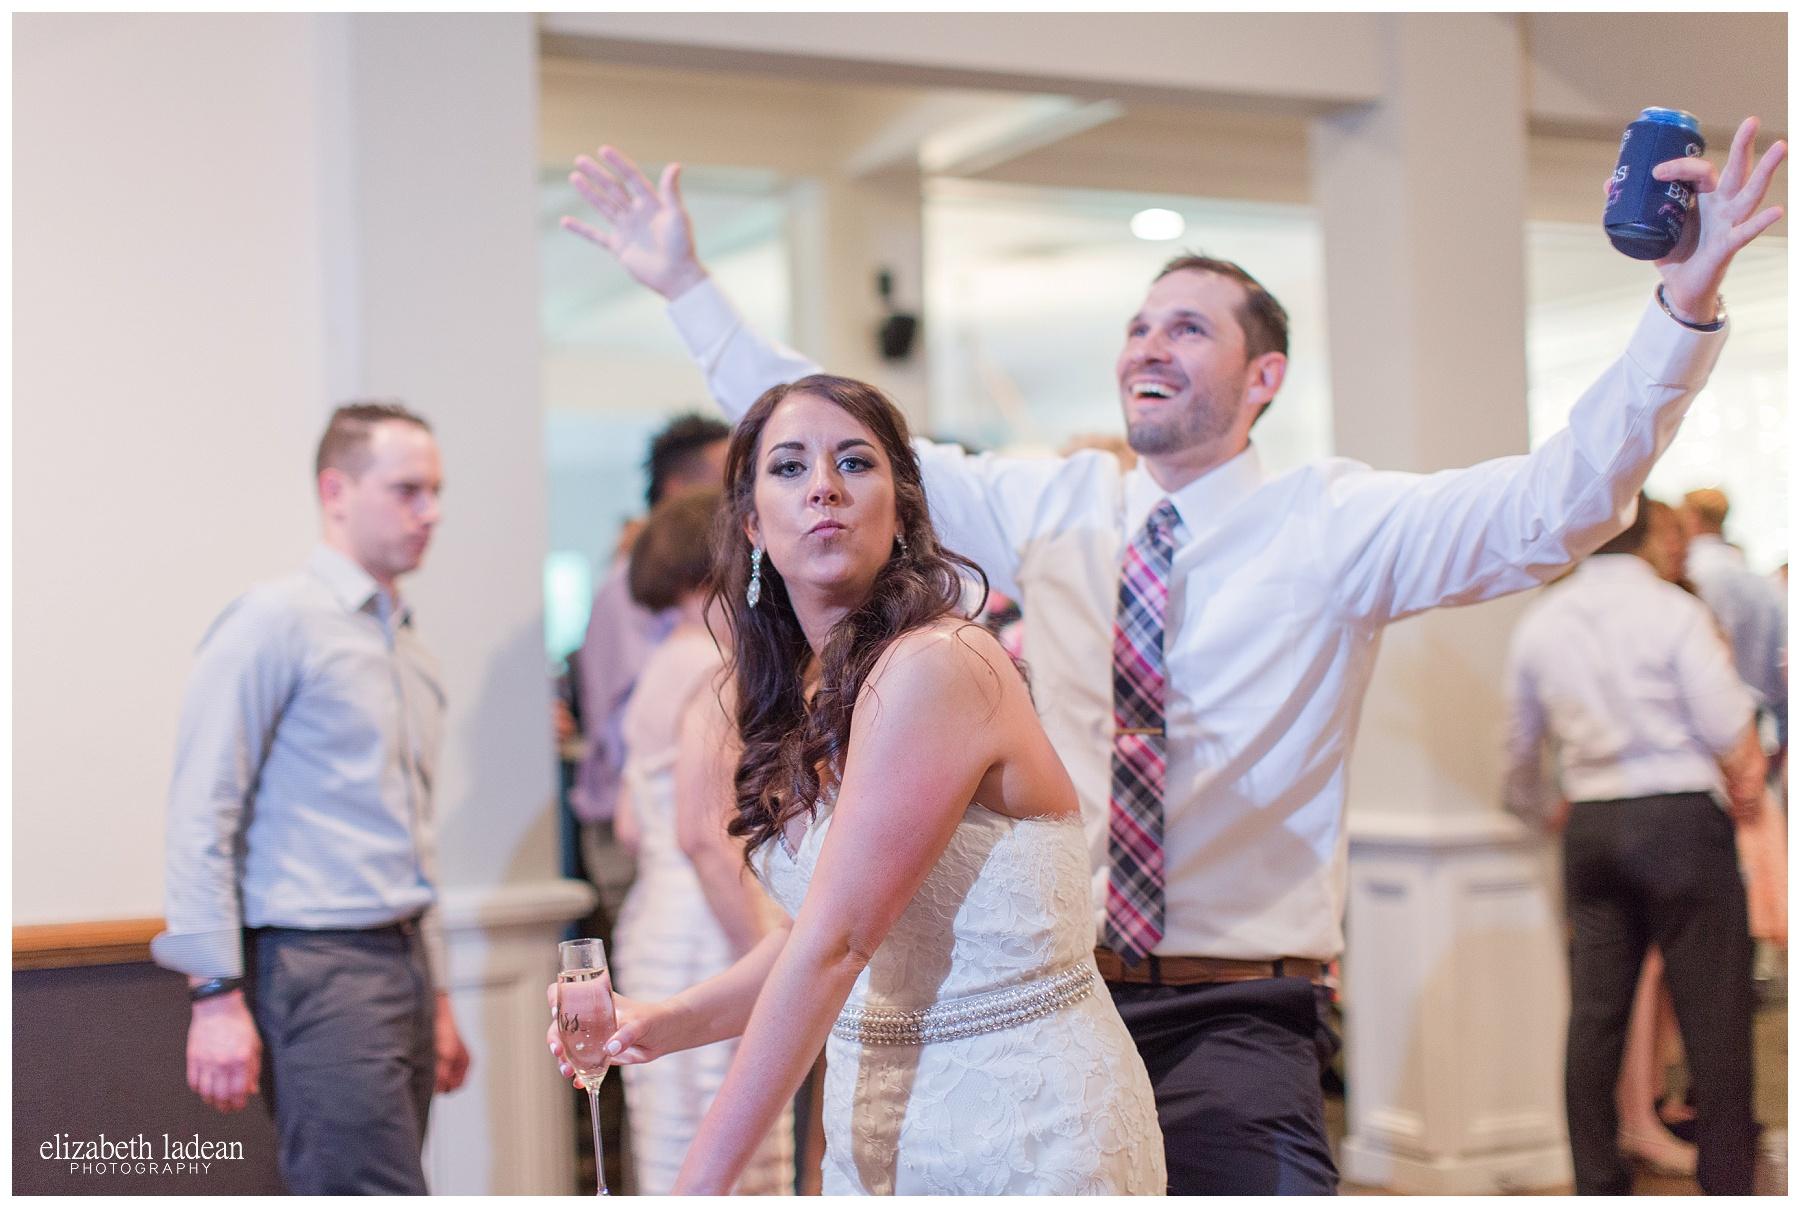 Hillcrest-Country-Club-Kansas-City-Wedding-Photography-E+J-0520-Elizabeth-Ladean-Photography-photo_0865.jpg